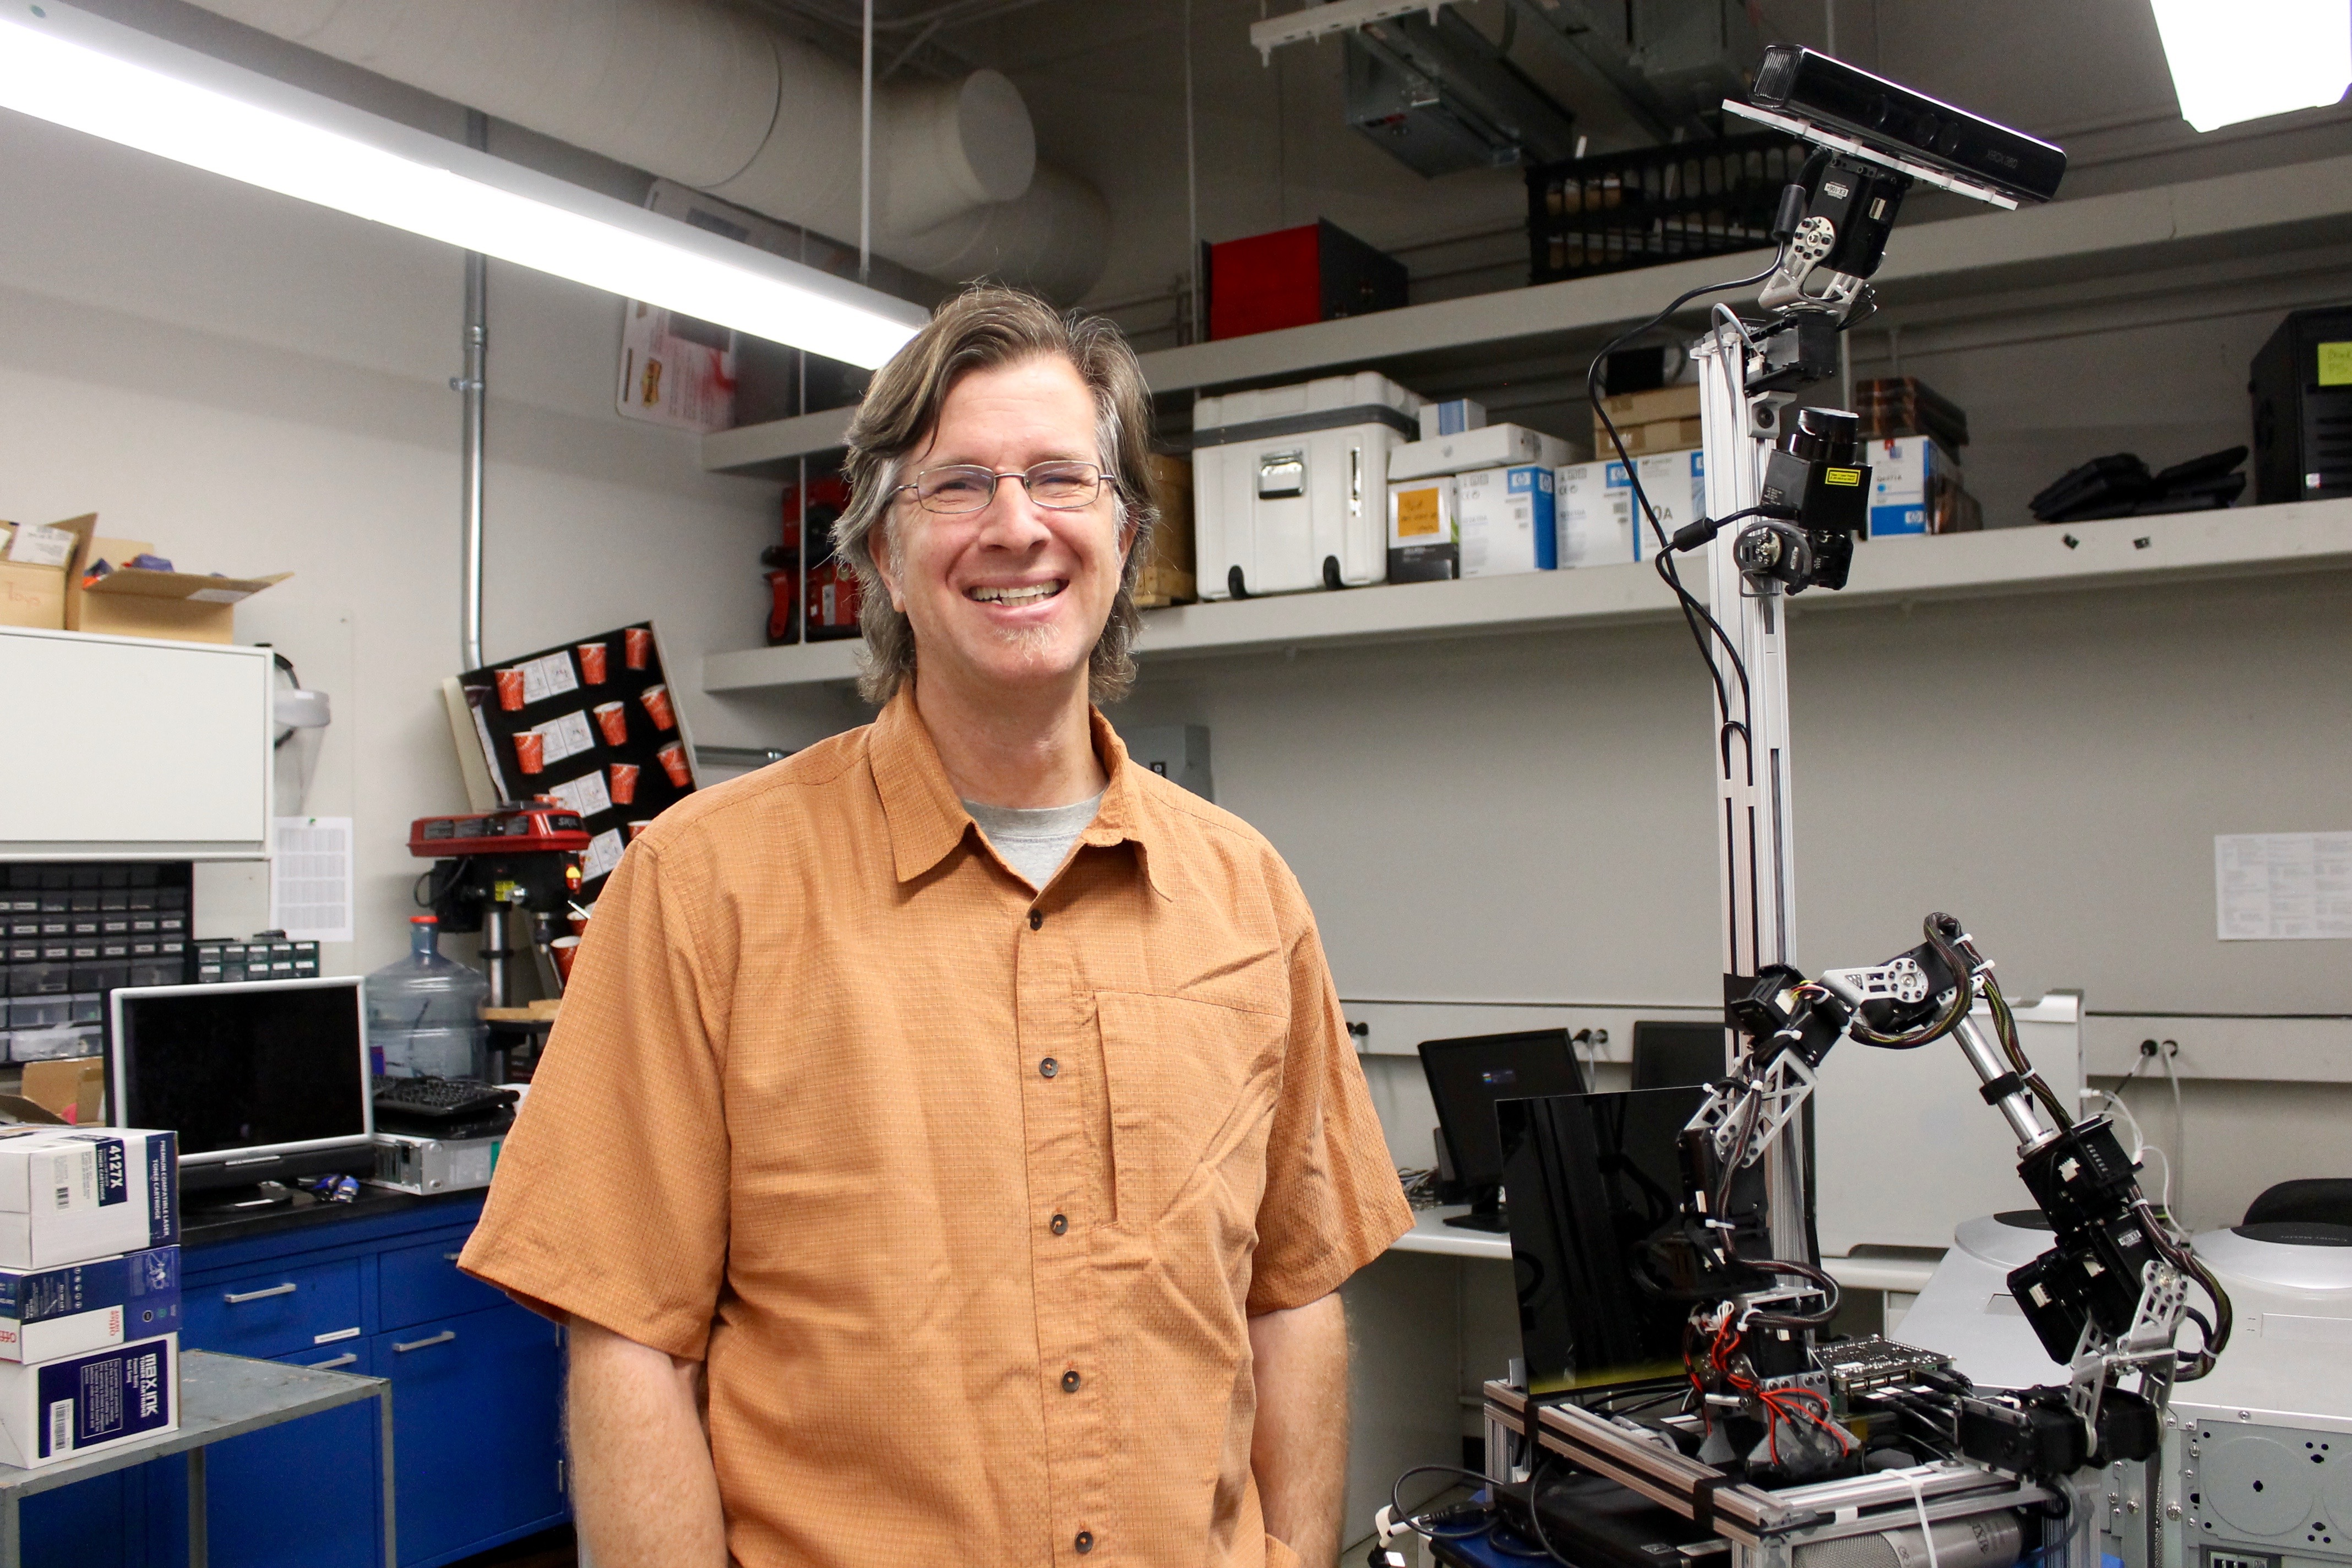 School of Information associate professor Clayton Morrison in his robotics lab